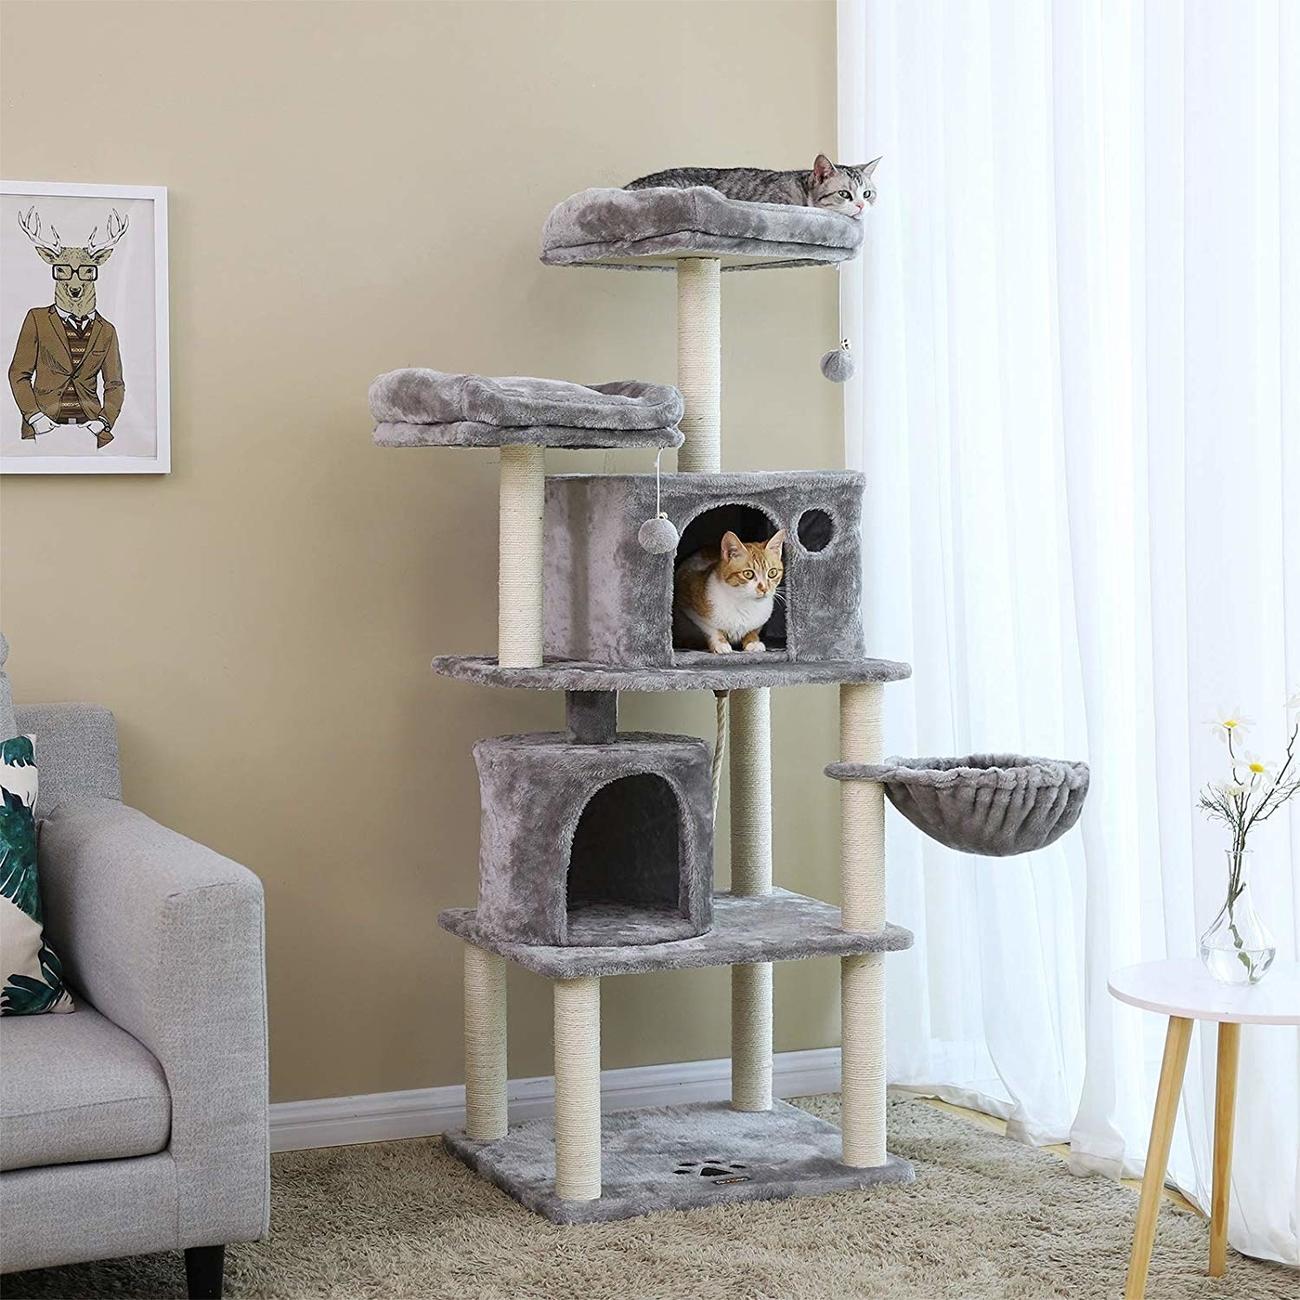 FEANDREA Katzen Kratzbaum mit 2 Höhlen, Bild 14